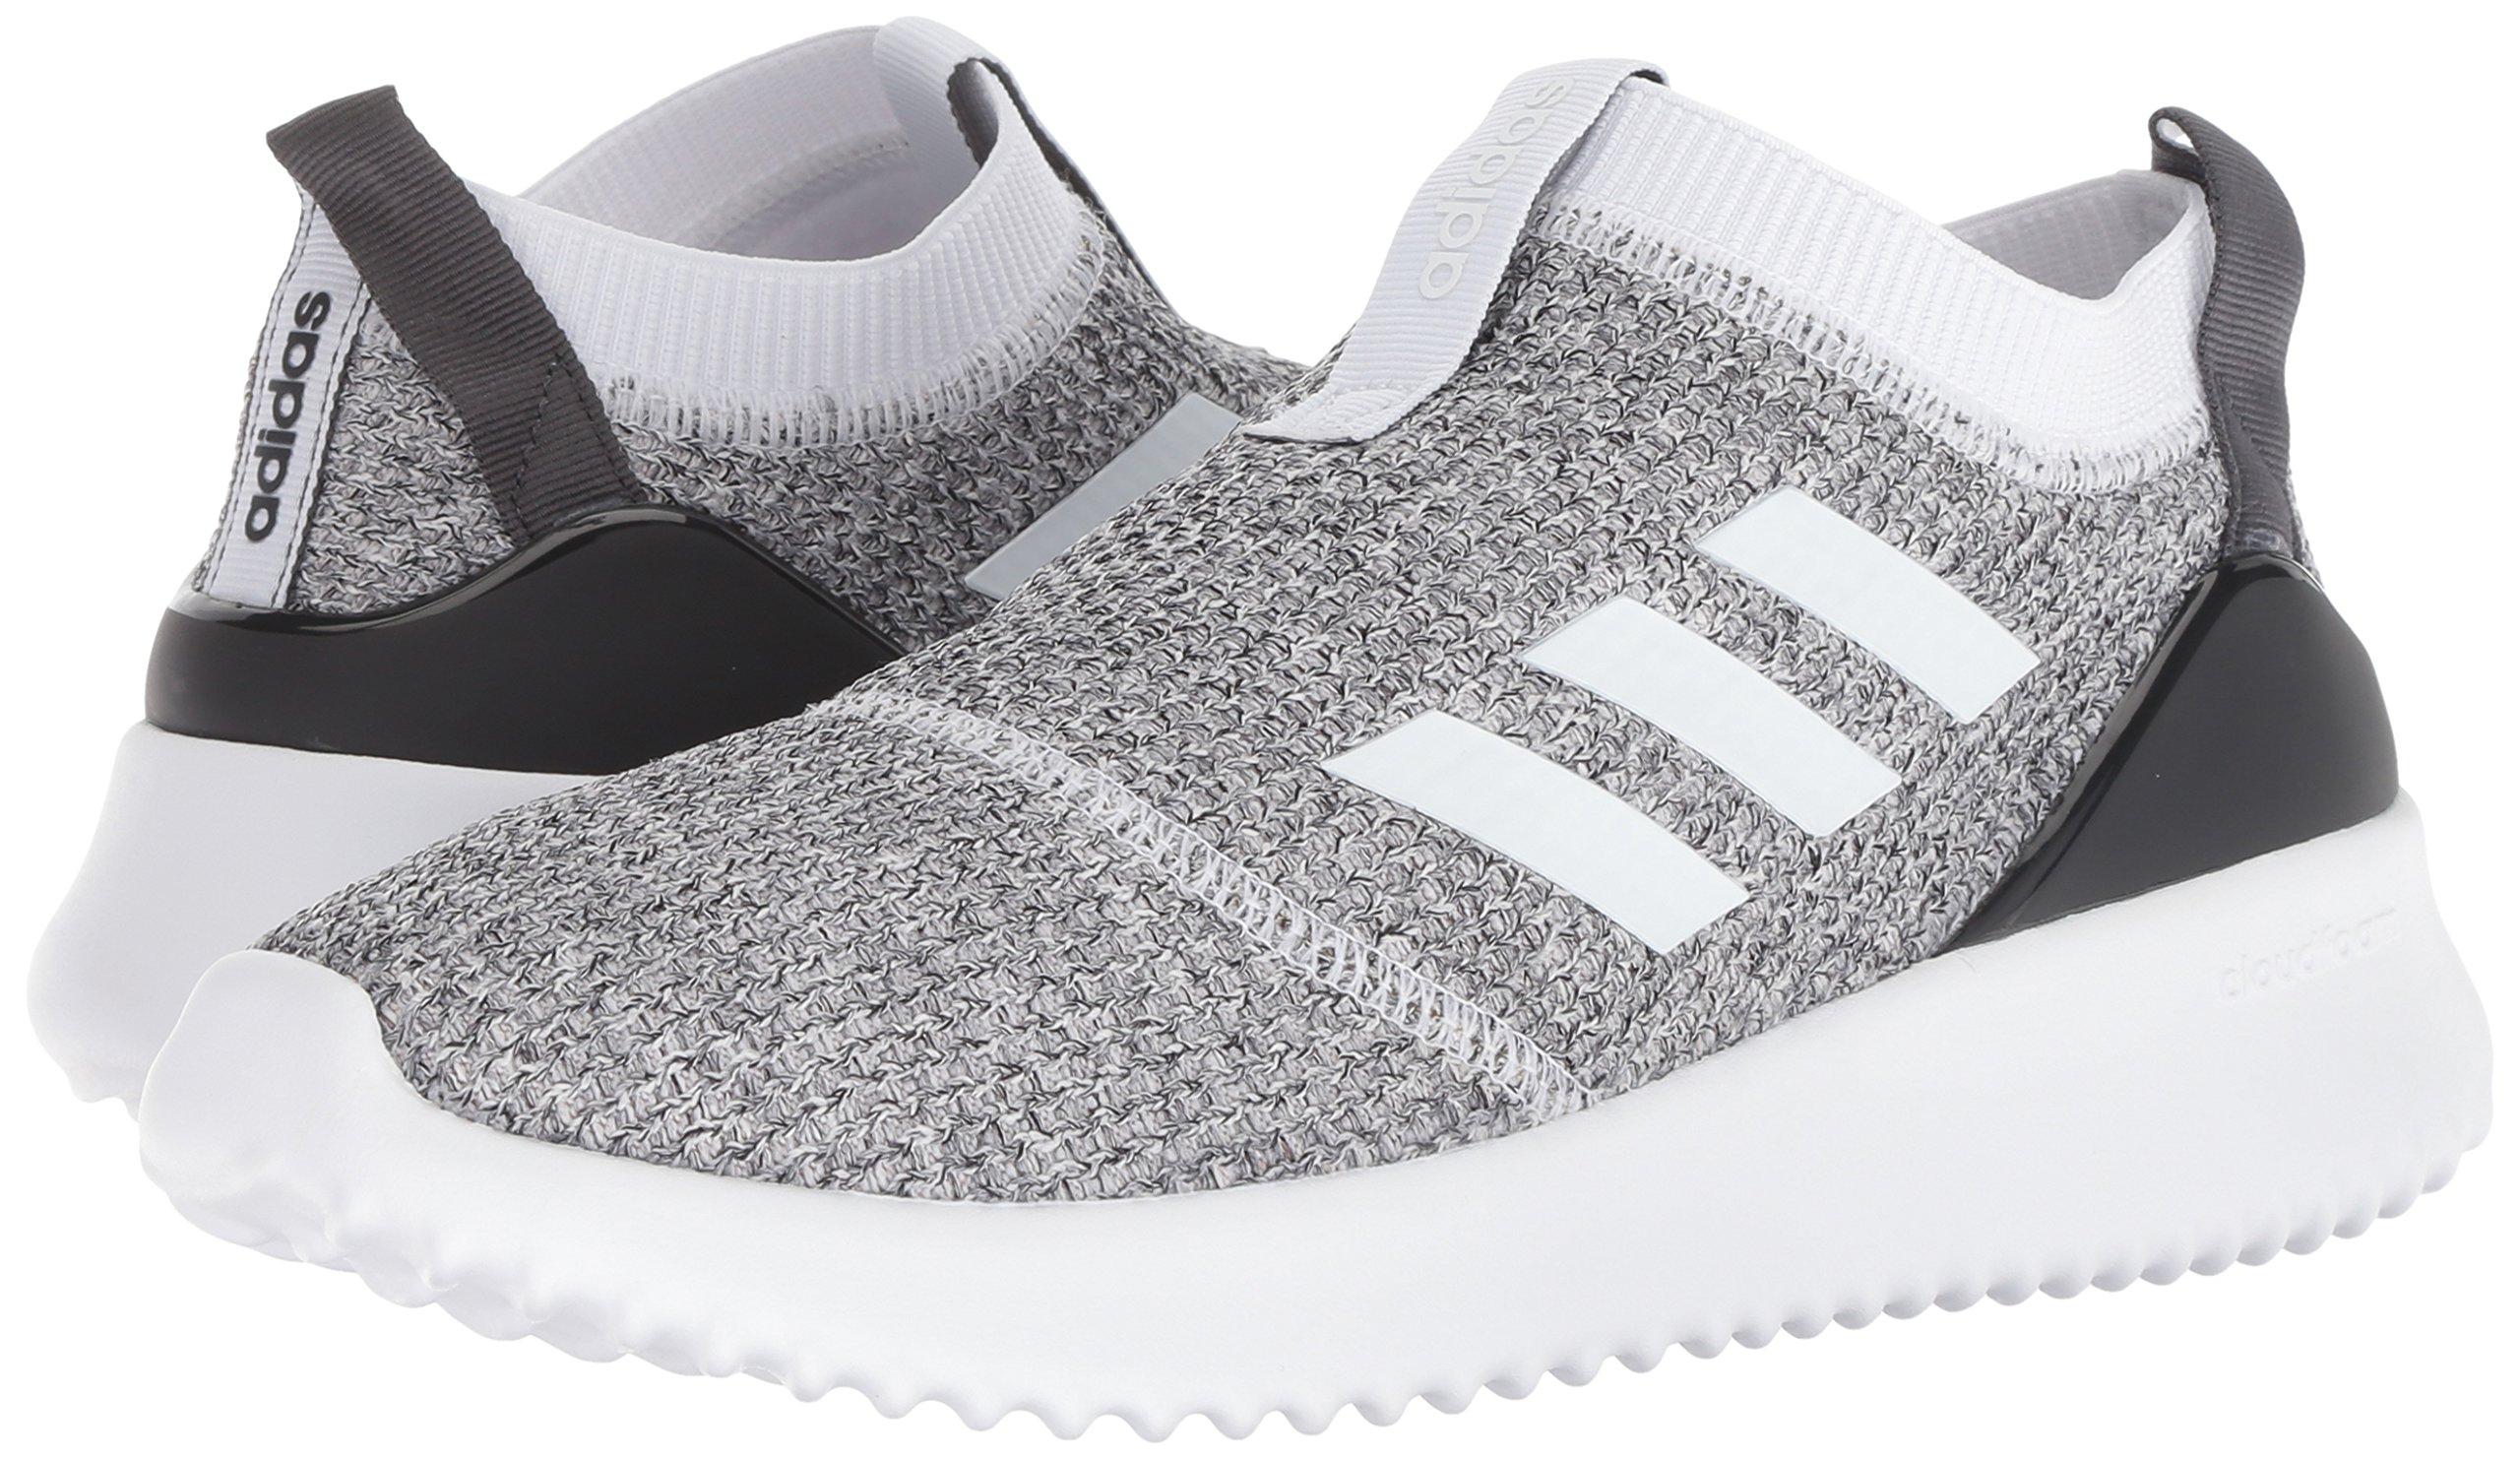 adidas Women's Ultimafusion Running Shoe, White/White/Black, 8 M US by adidas (Image #5)